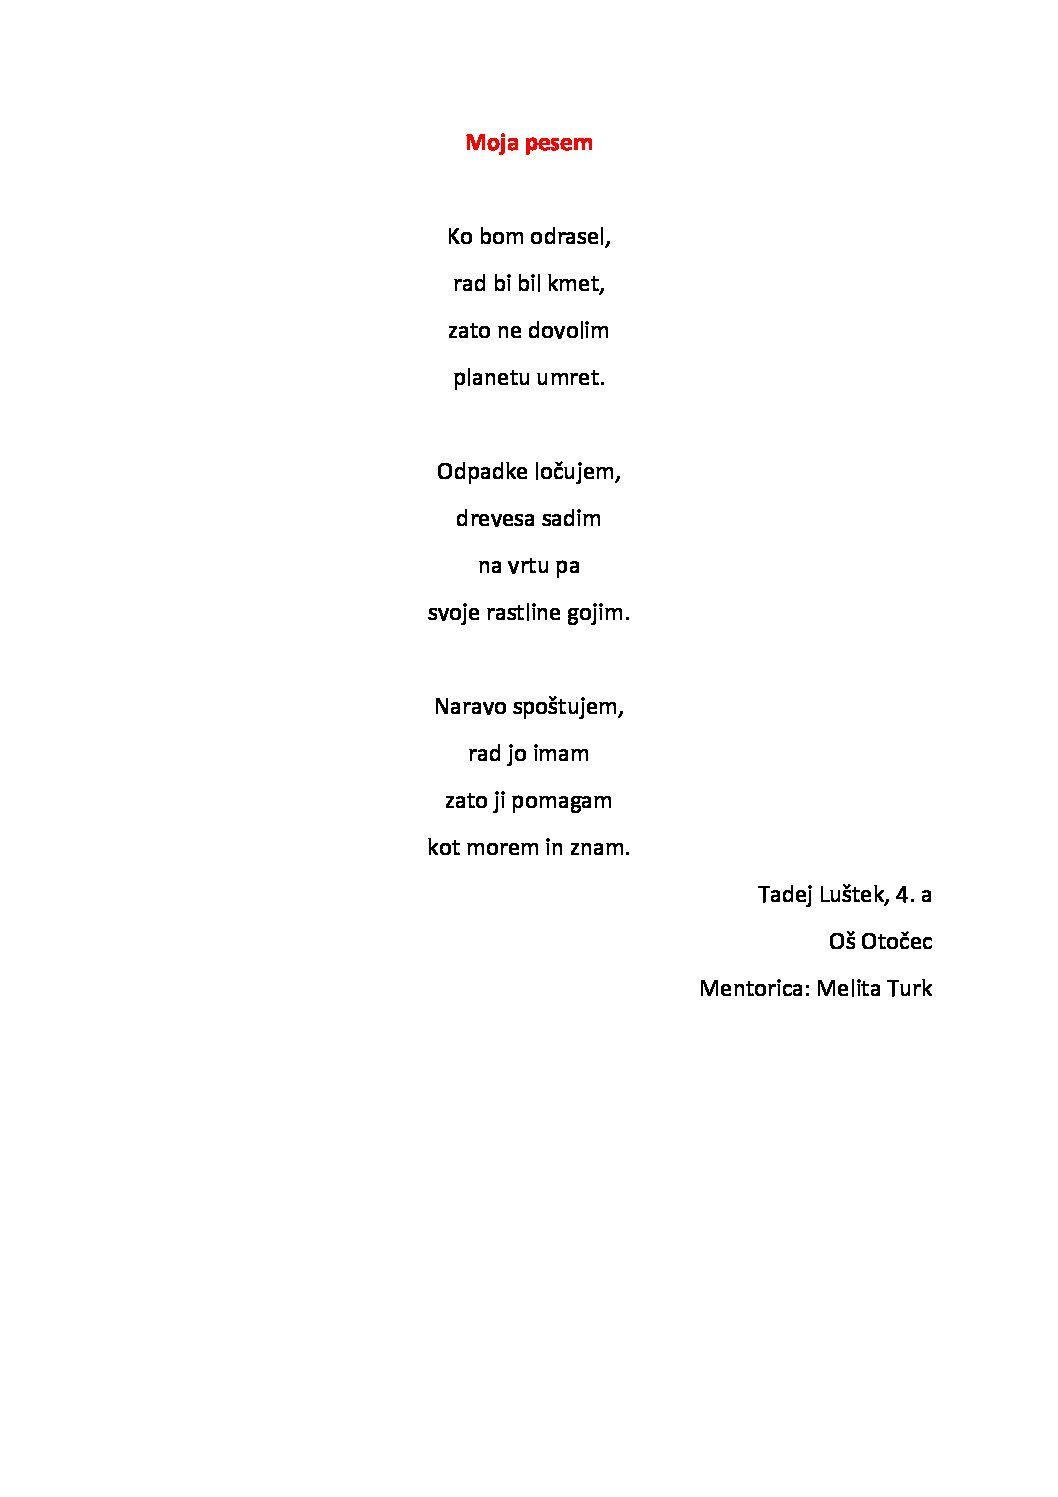 Tadej Luštek: Pesem